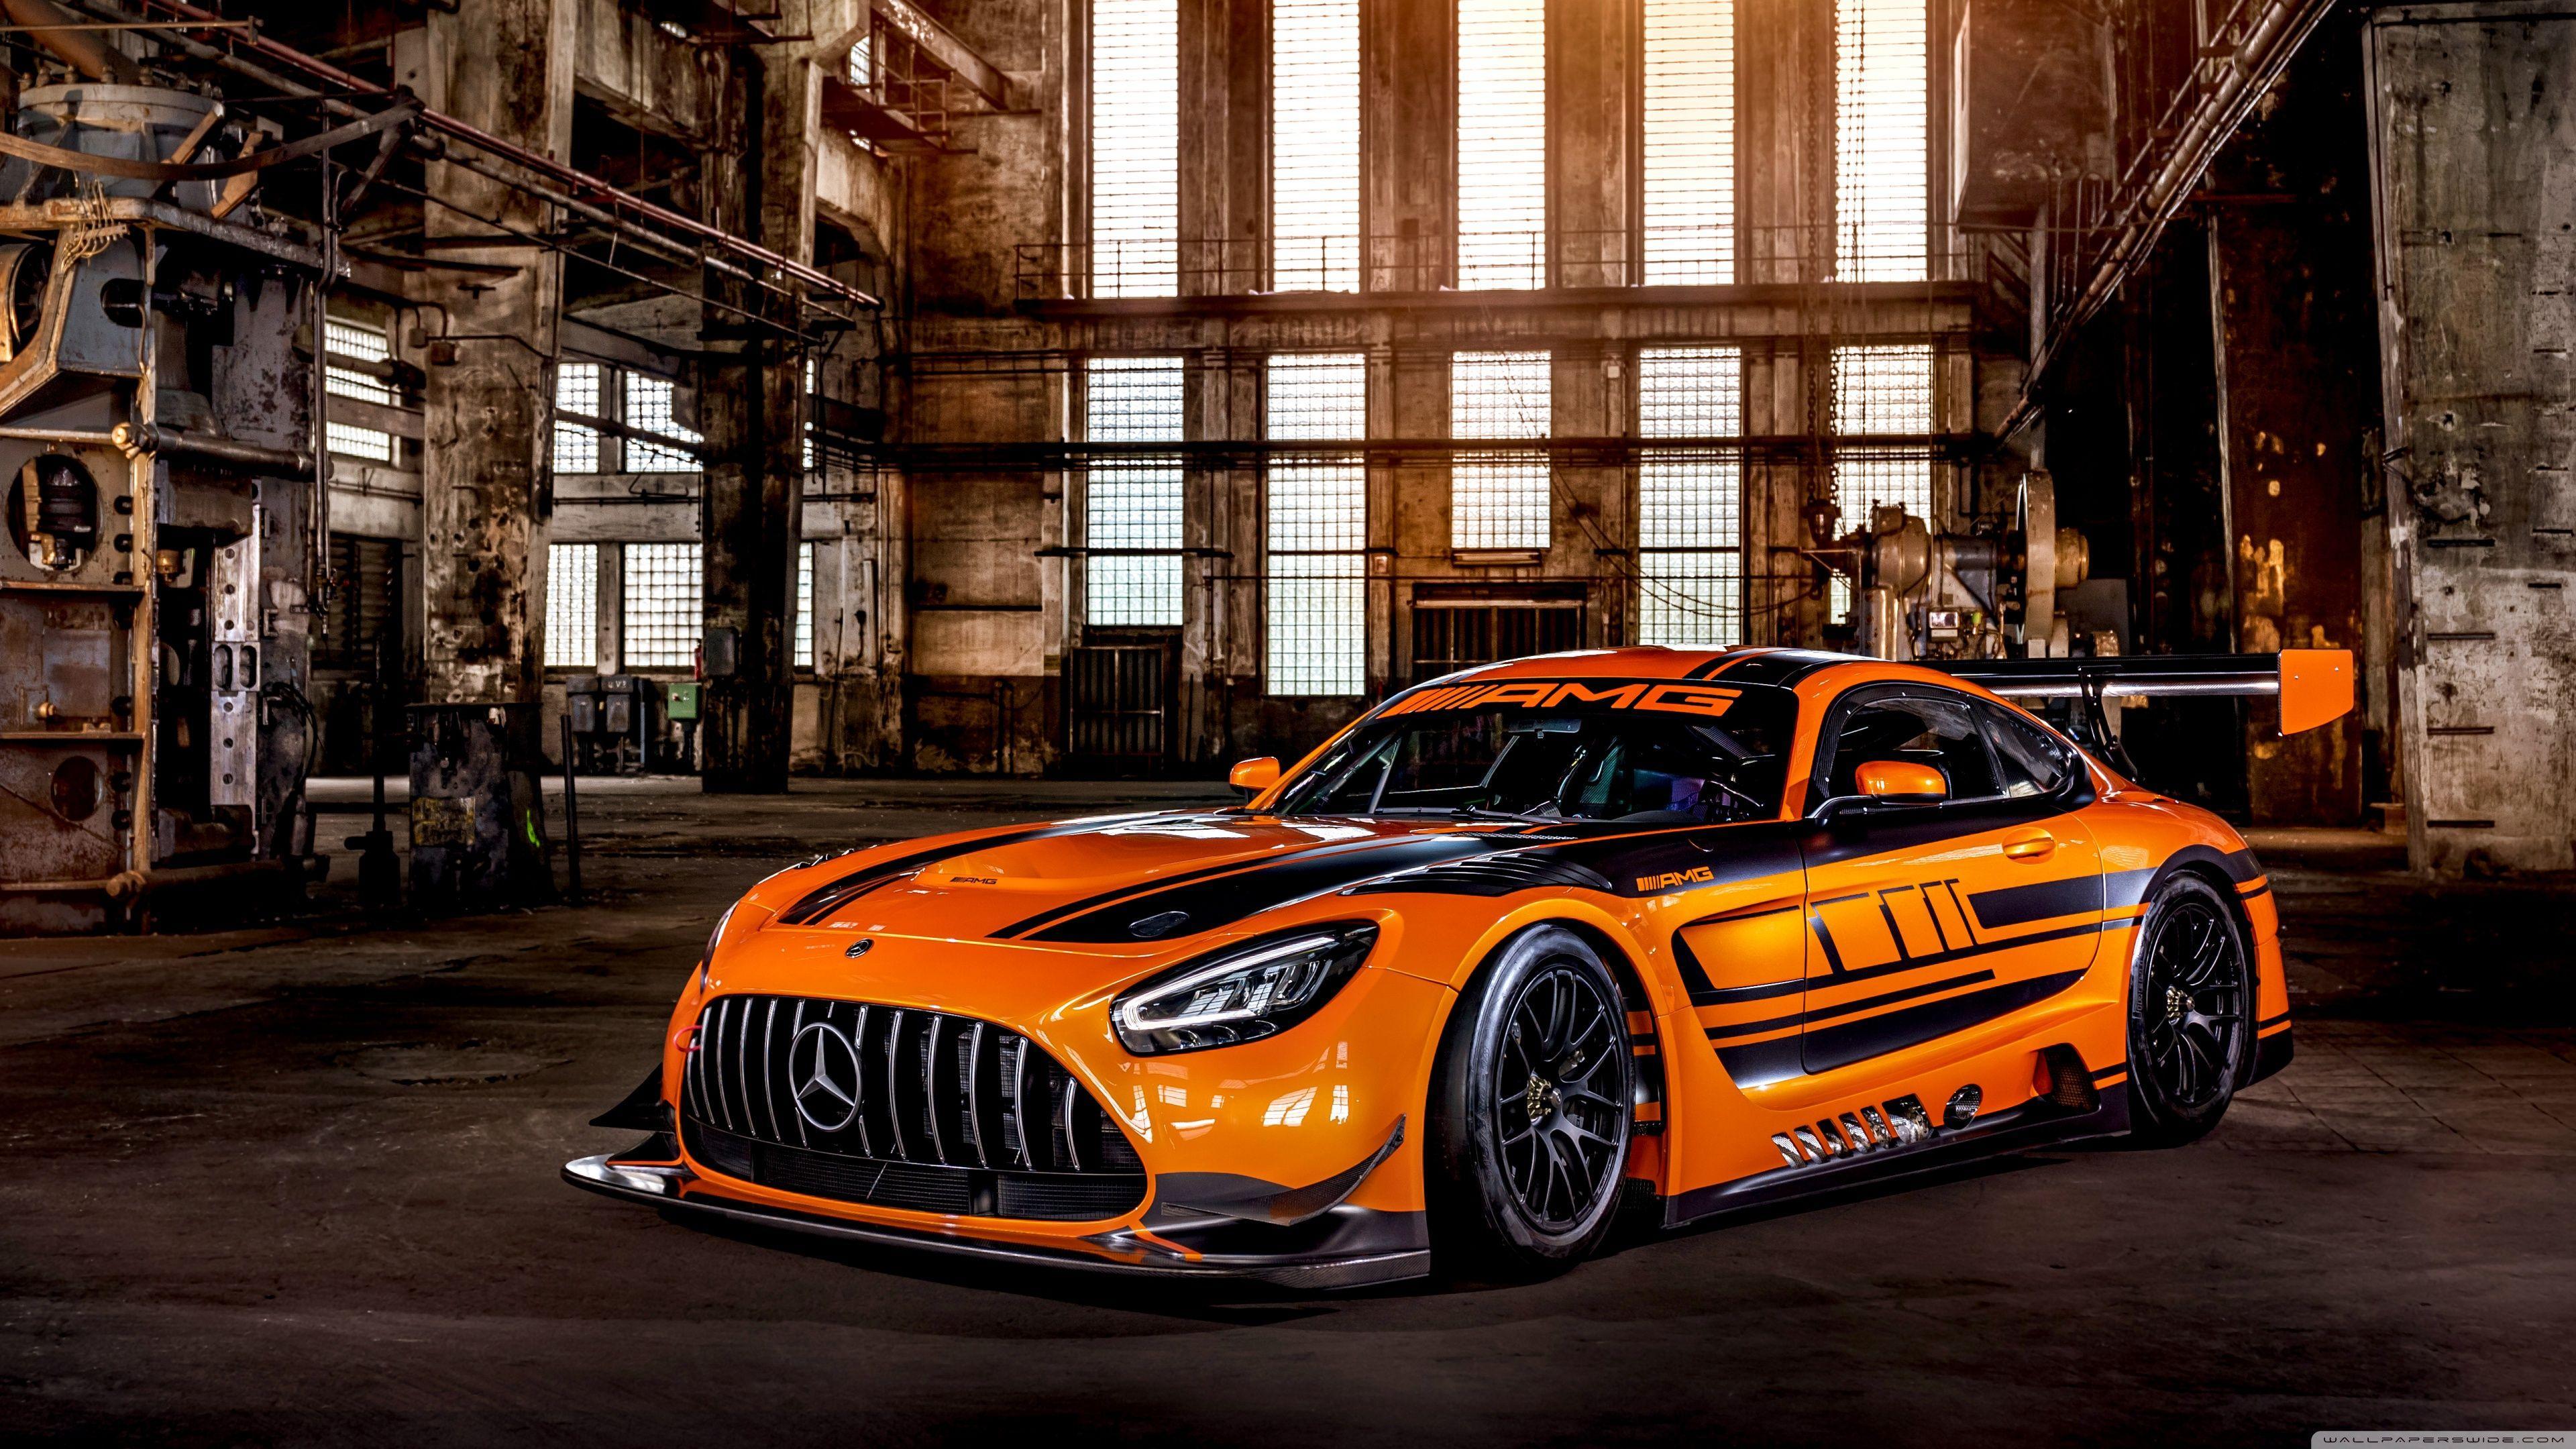 Car 4K Wallpapers - Top Free Car 4K Backgrounds ...